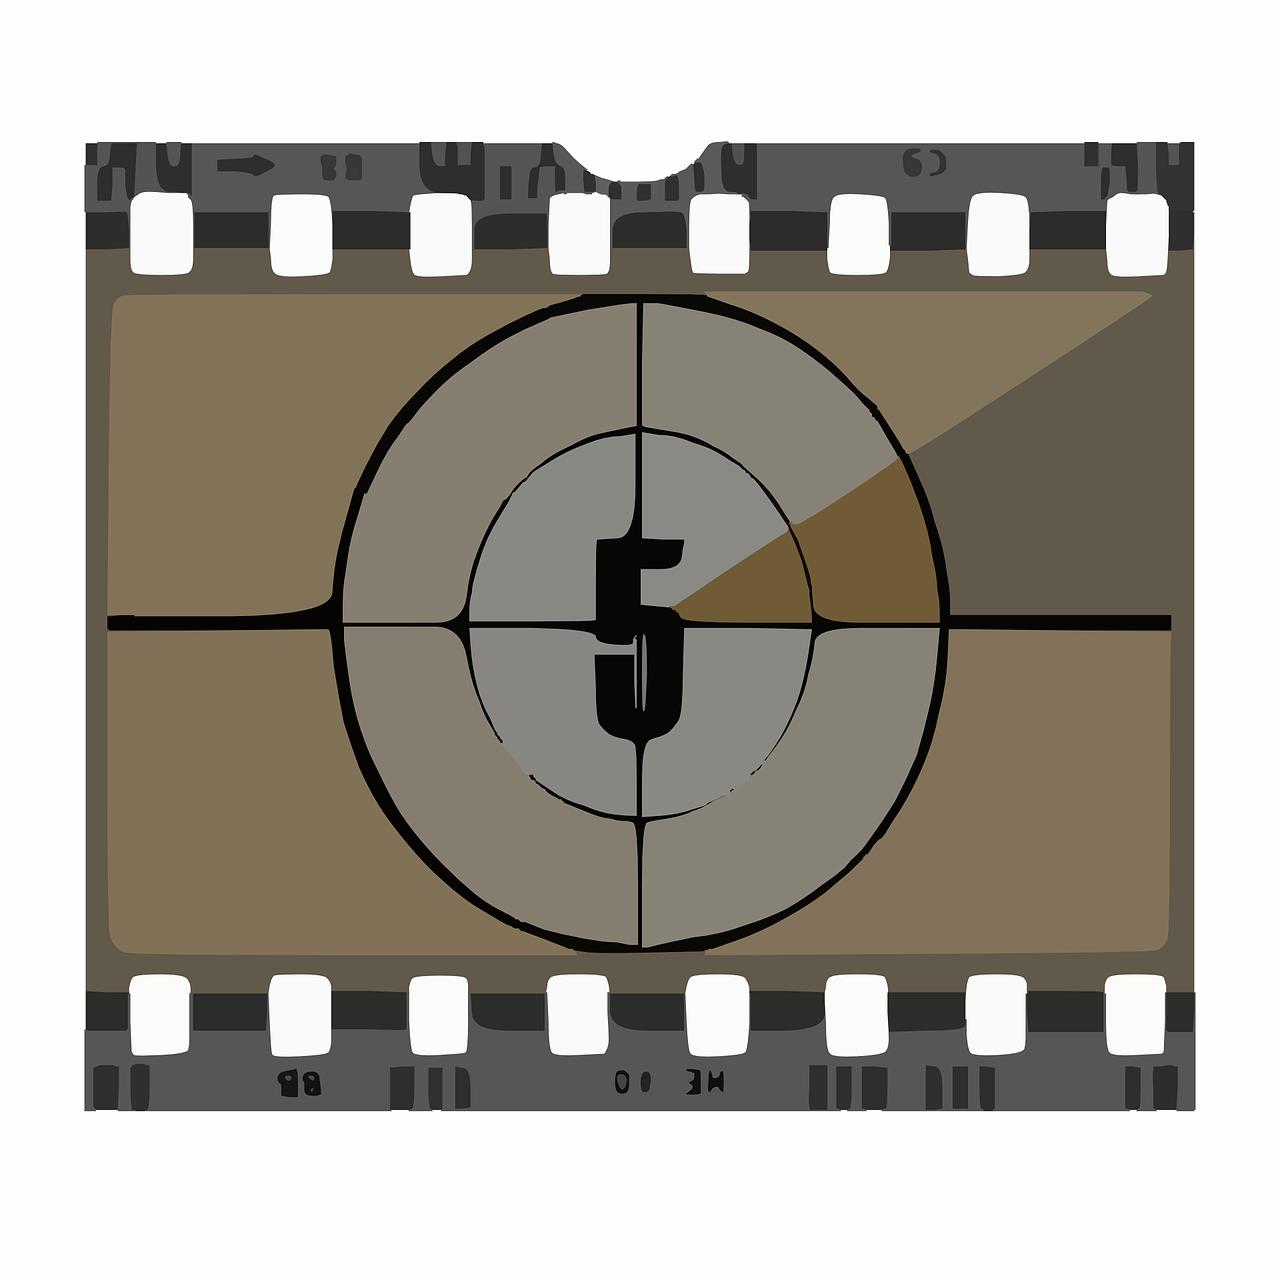 movie-297278_1280-1280x1280.png